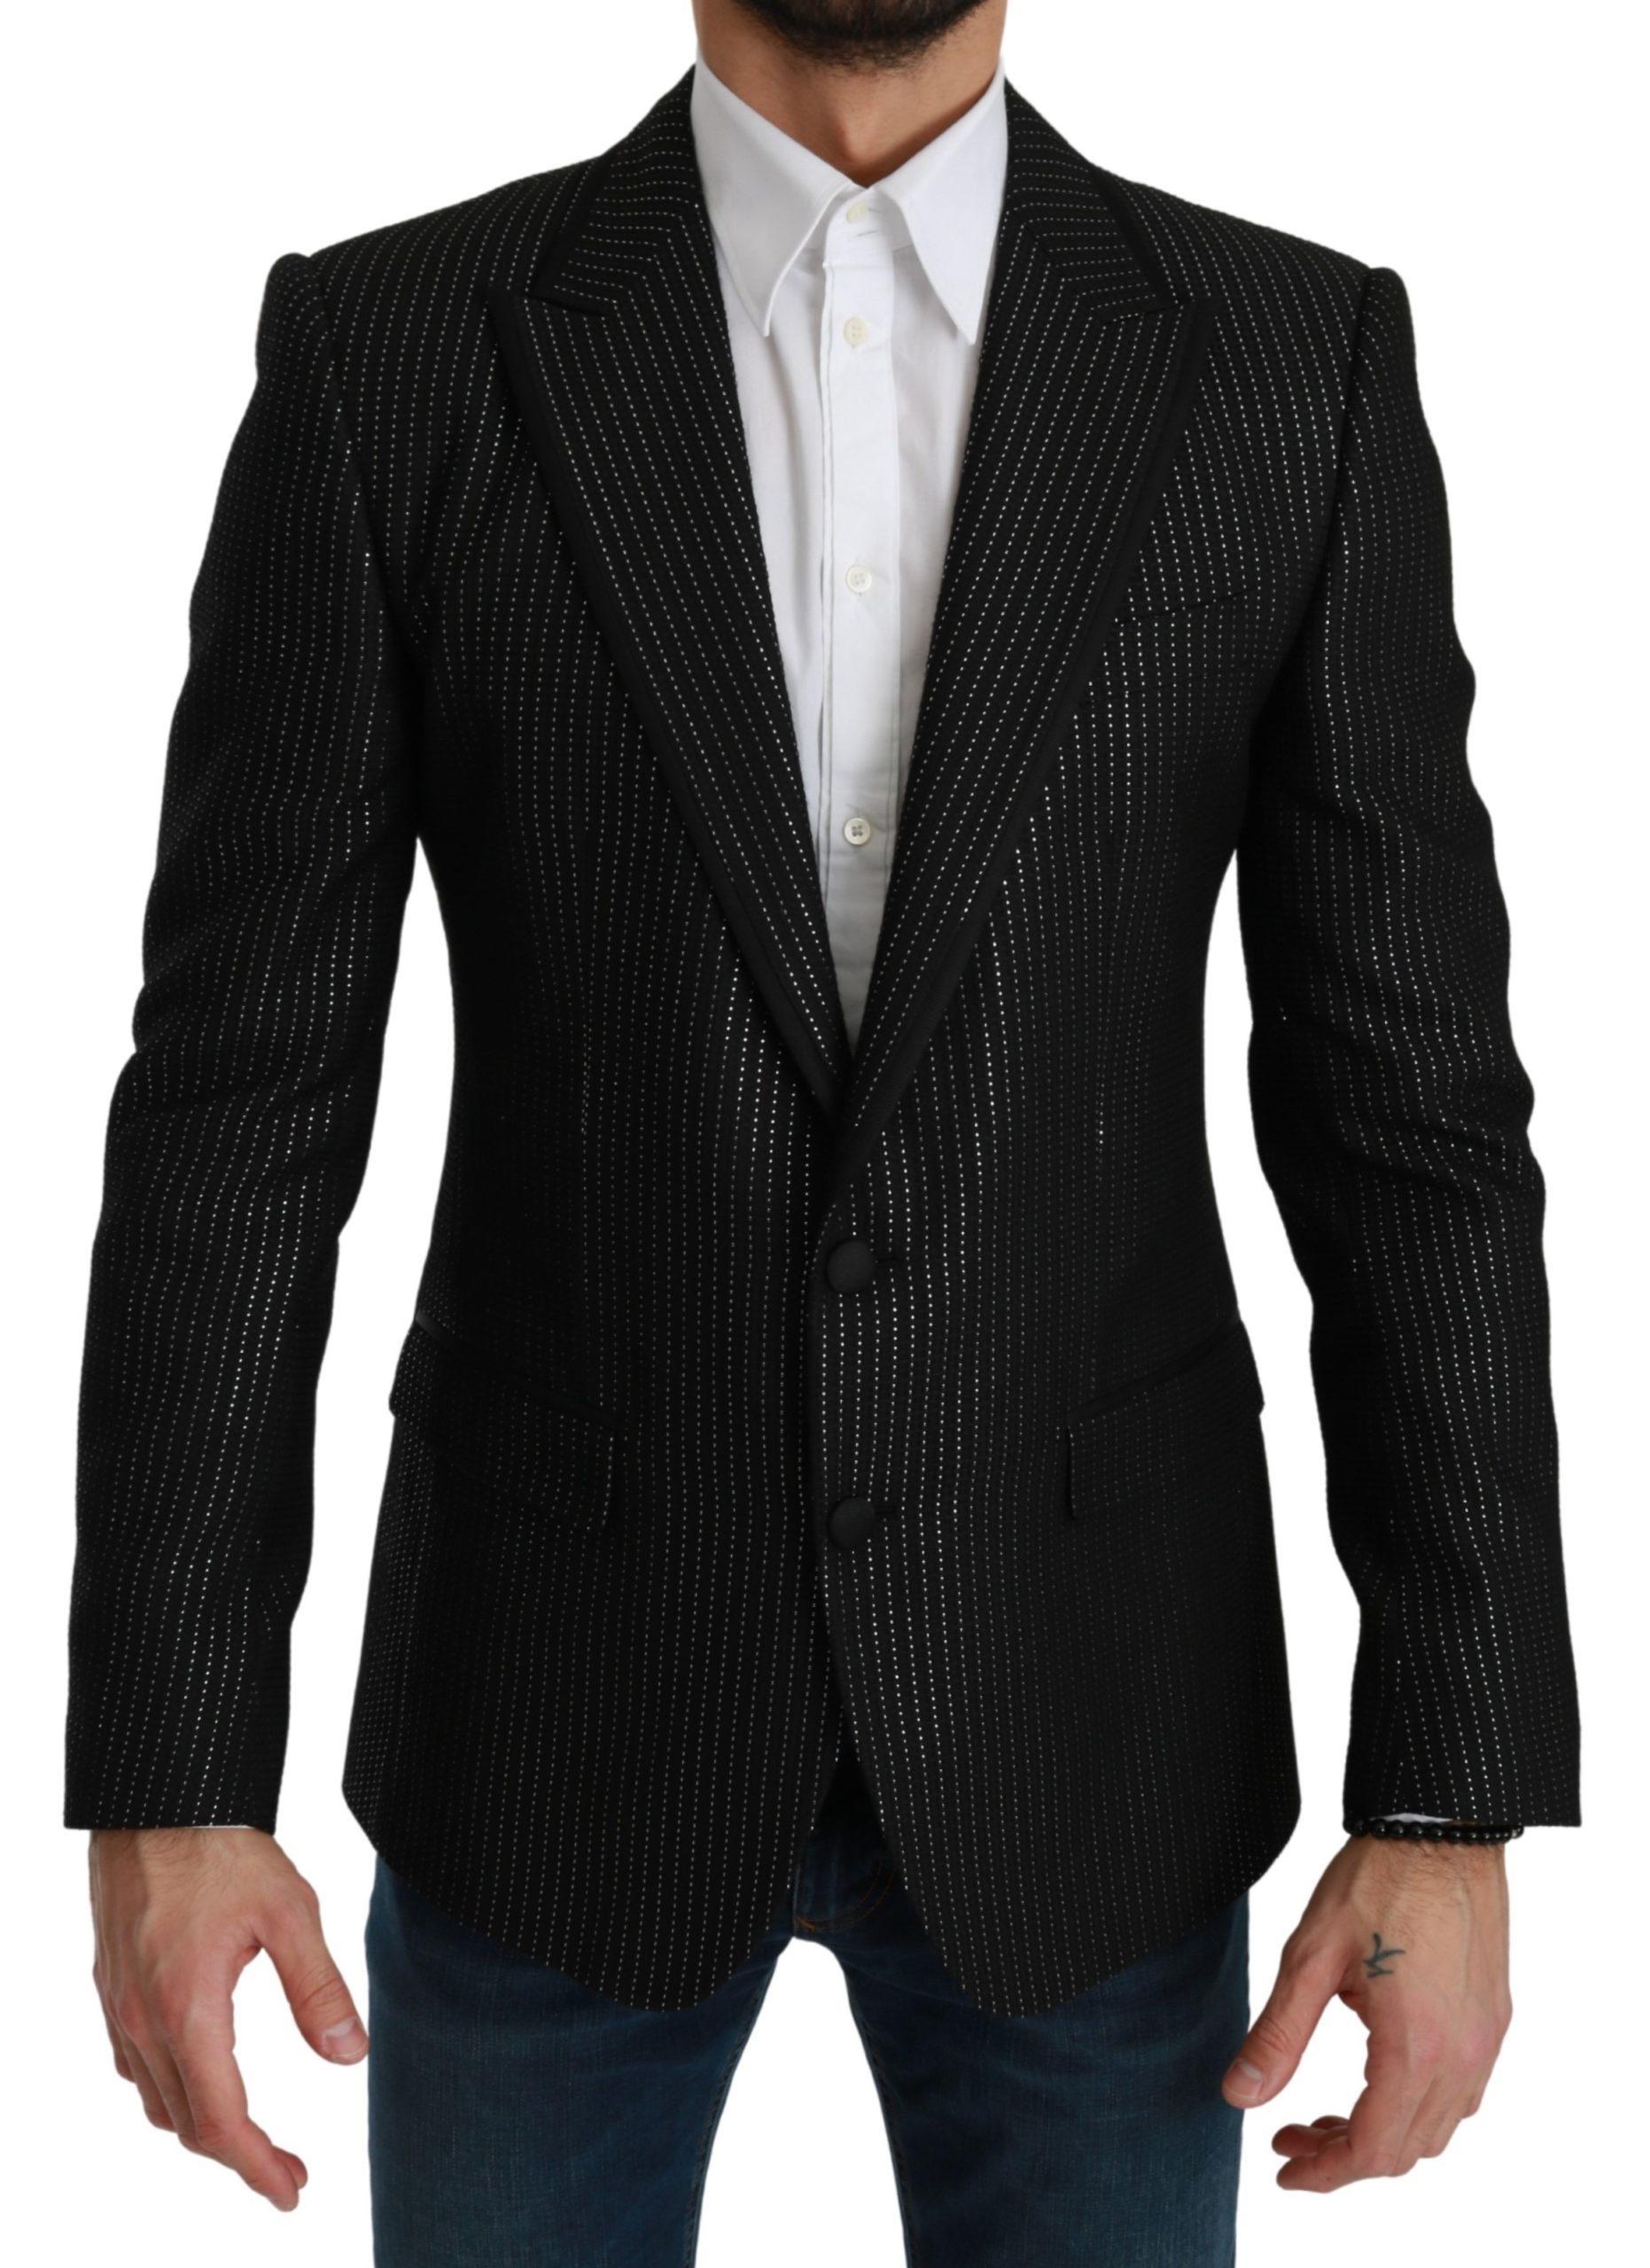 Dolce & Gabbana Men's Striped Single Breasted MARTINI Blazer Black KOS1738 - IT48 | M